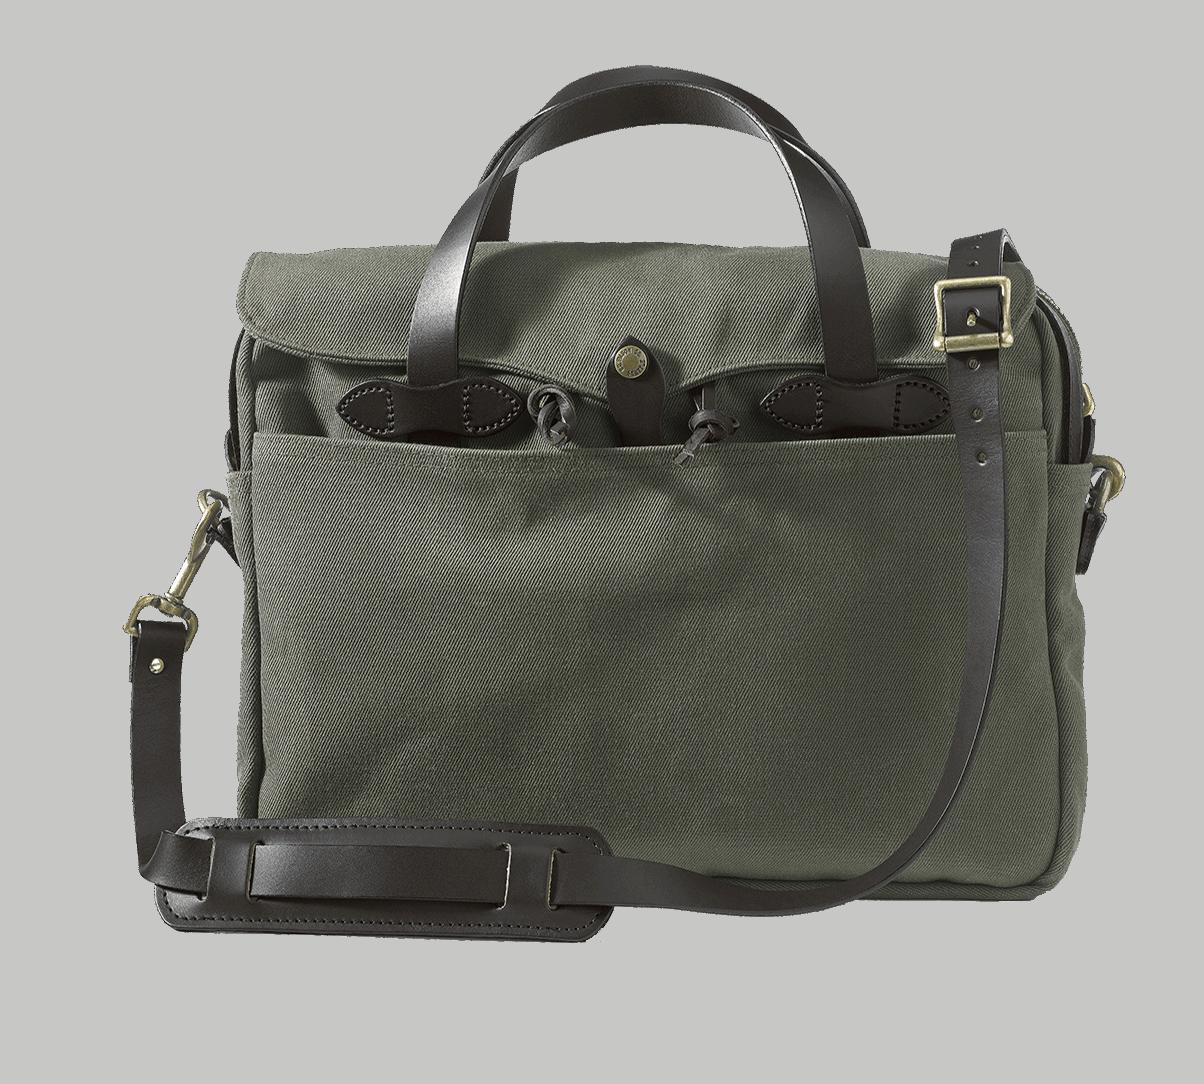 Filson Rugged Twill Original Briefcase - Otter Green